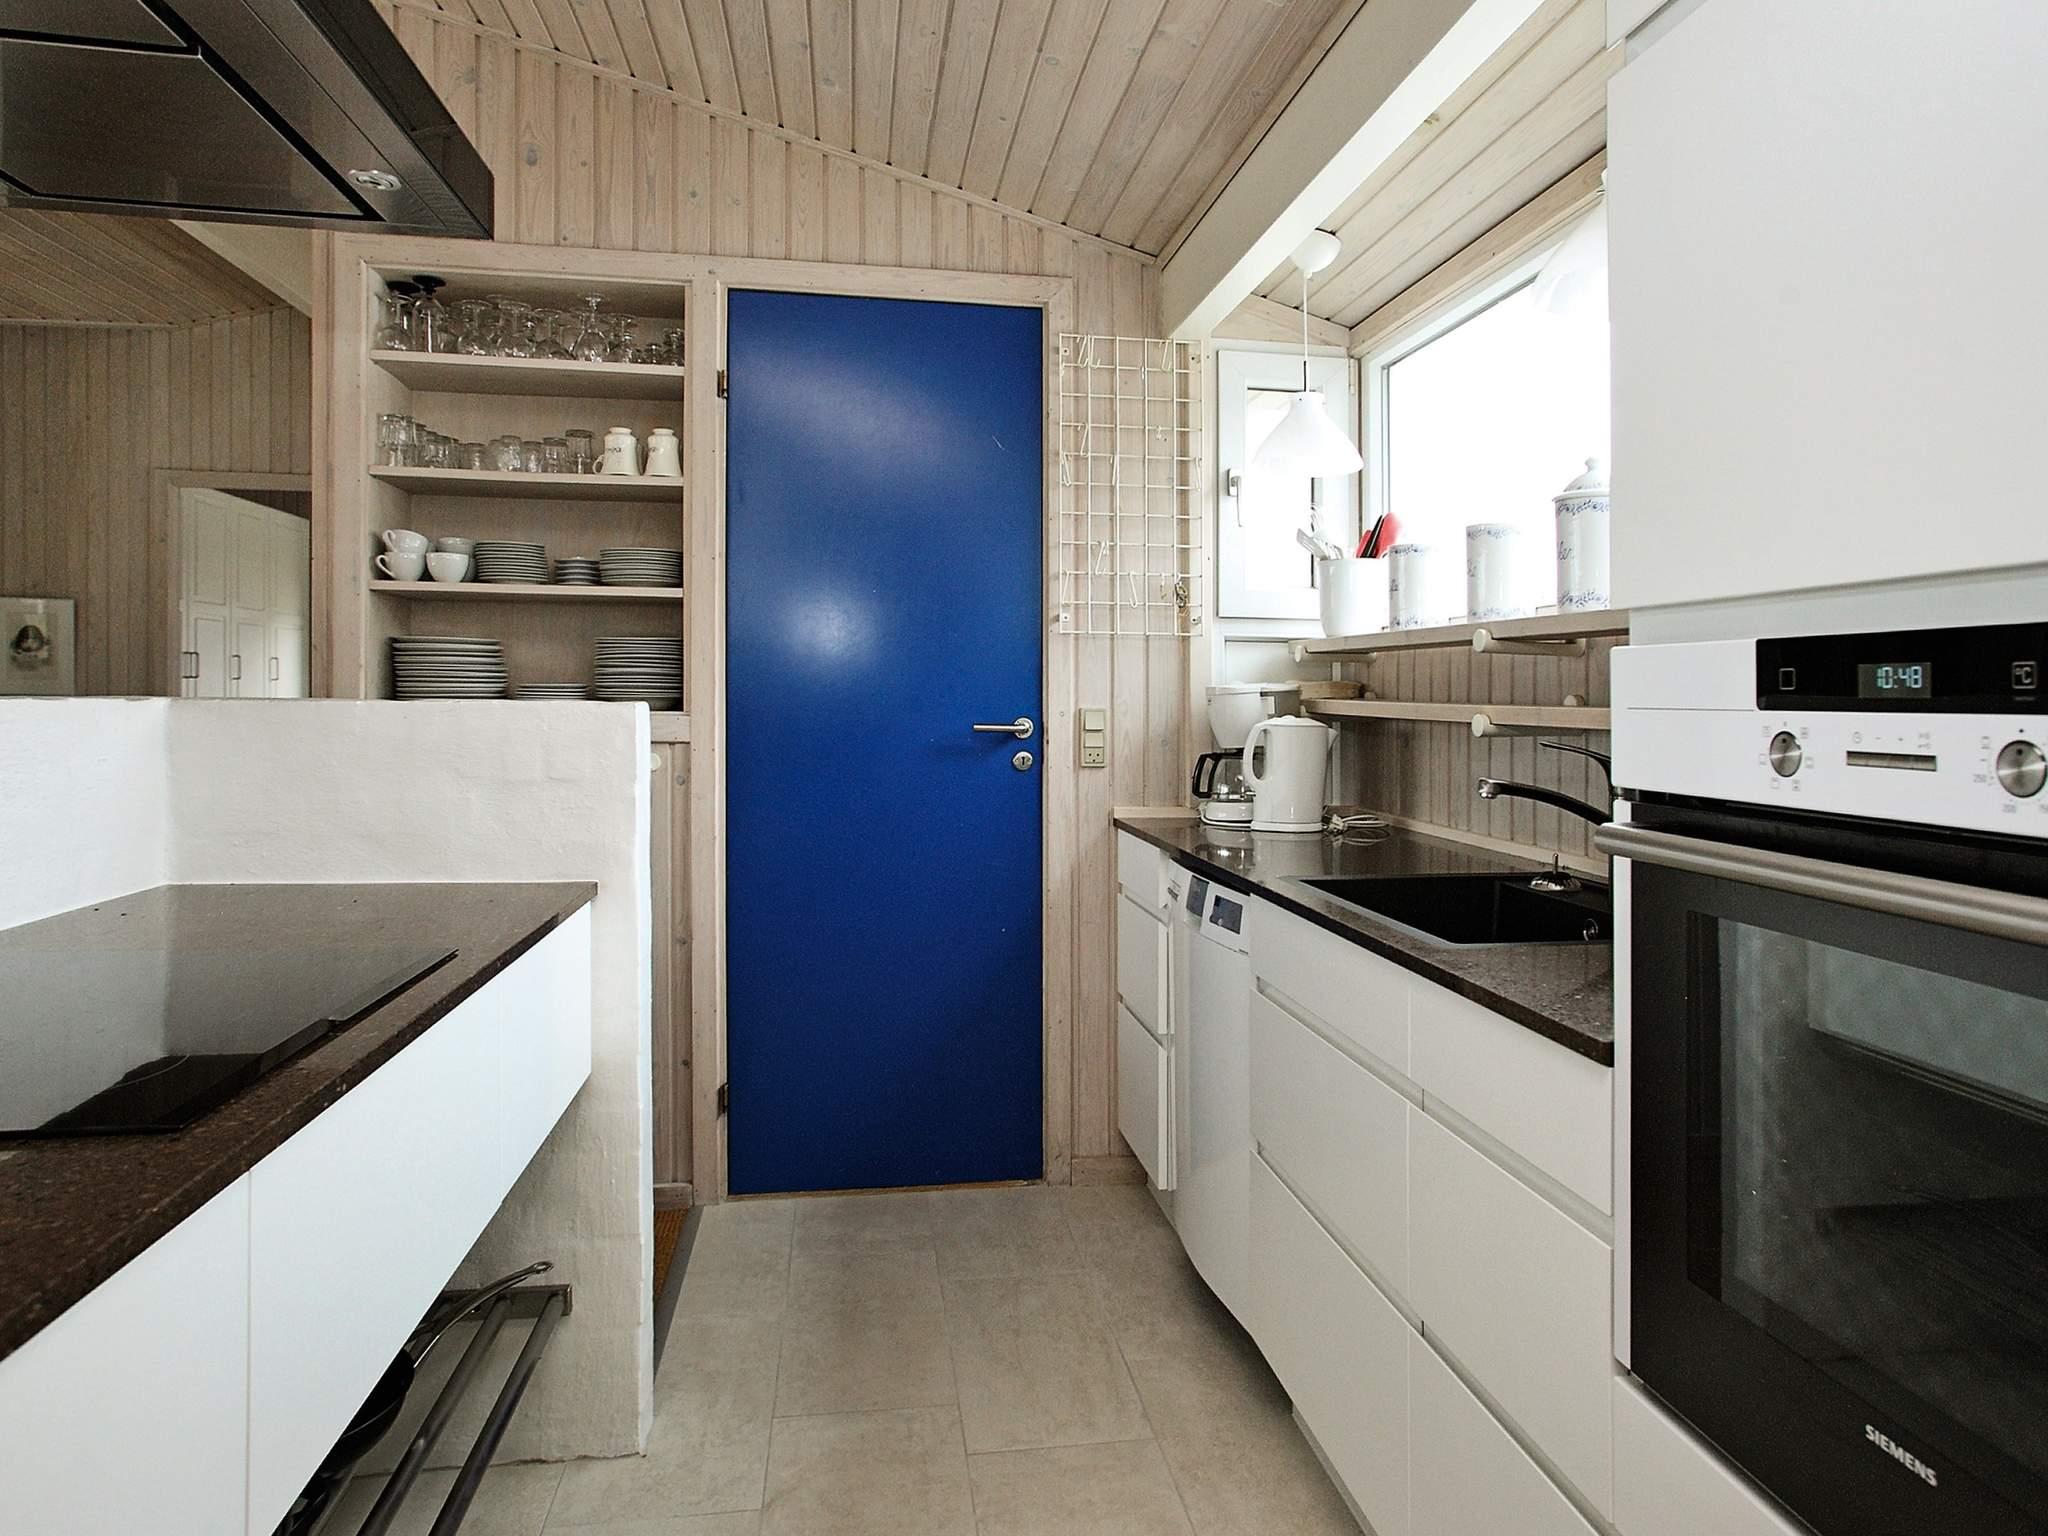 Ferienhaus Grønhøj Strand (89148), Løkken, , Nordwestjütland, Dänemark, Bild 5